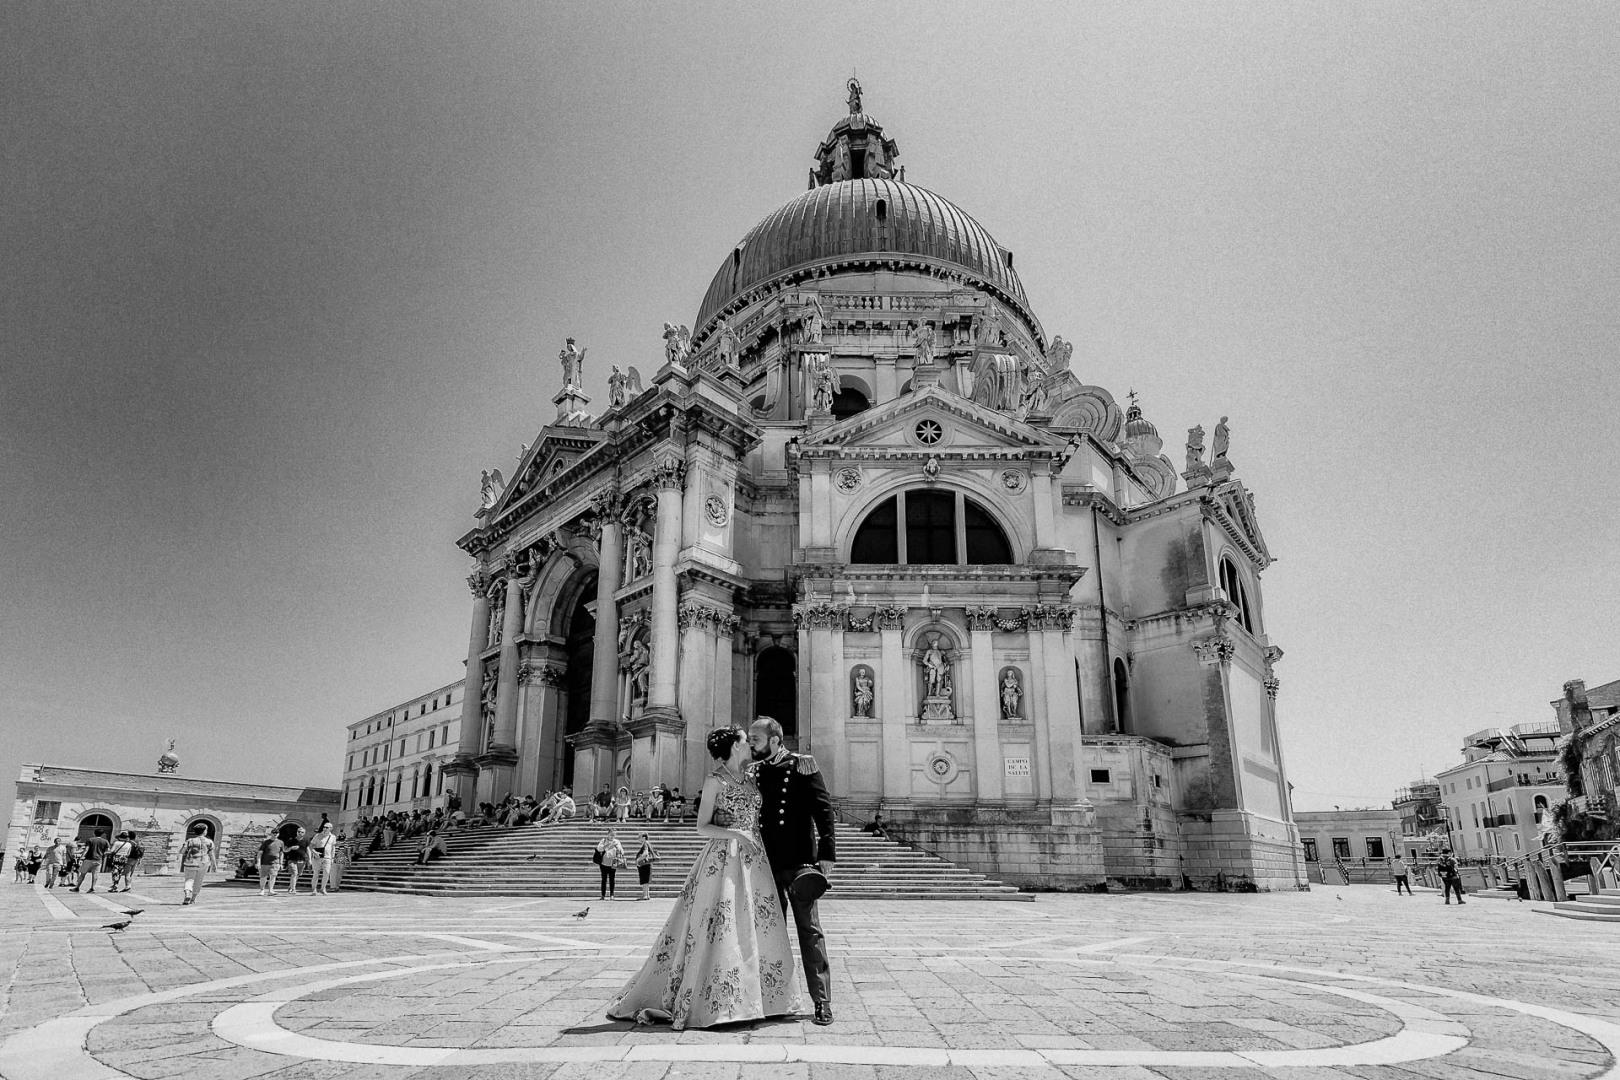 NicolaDaLio-Venezia-Rist_Dei_Contorni-123